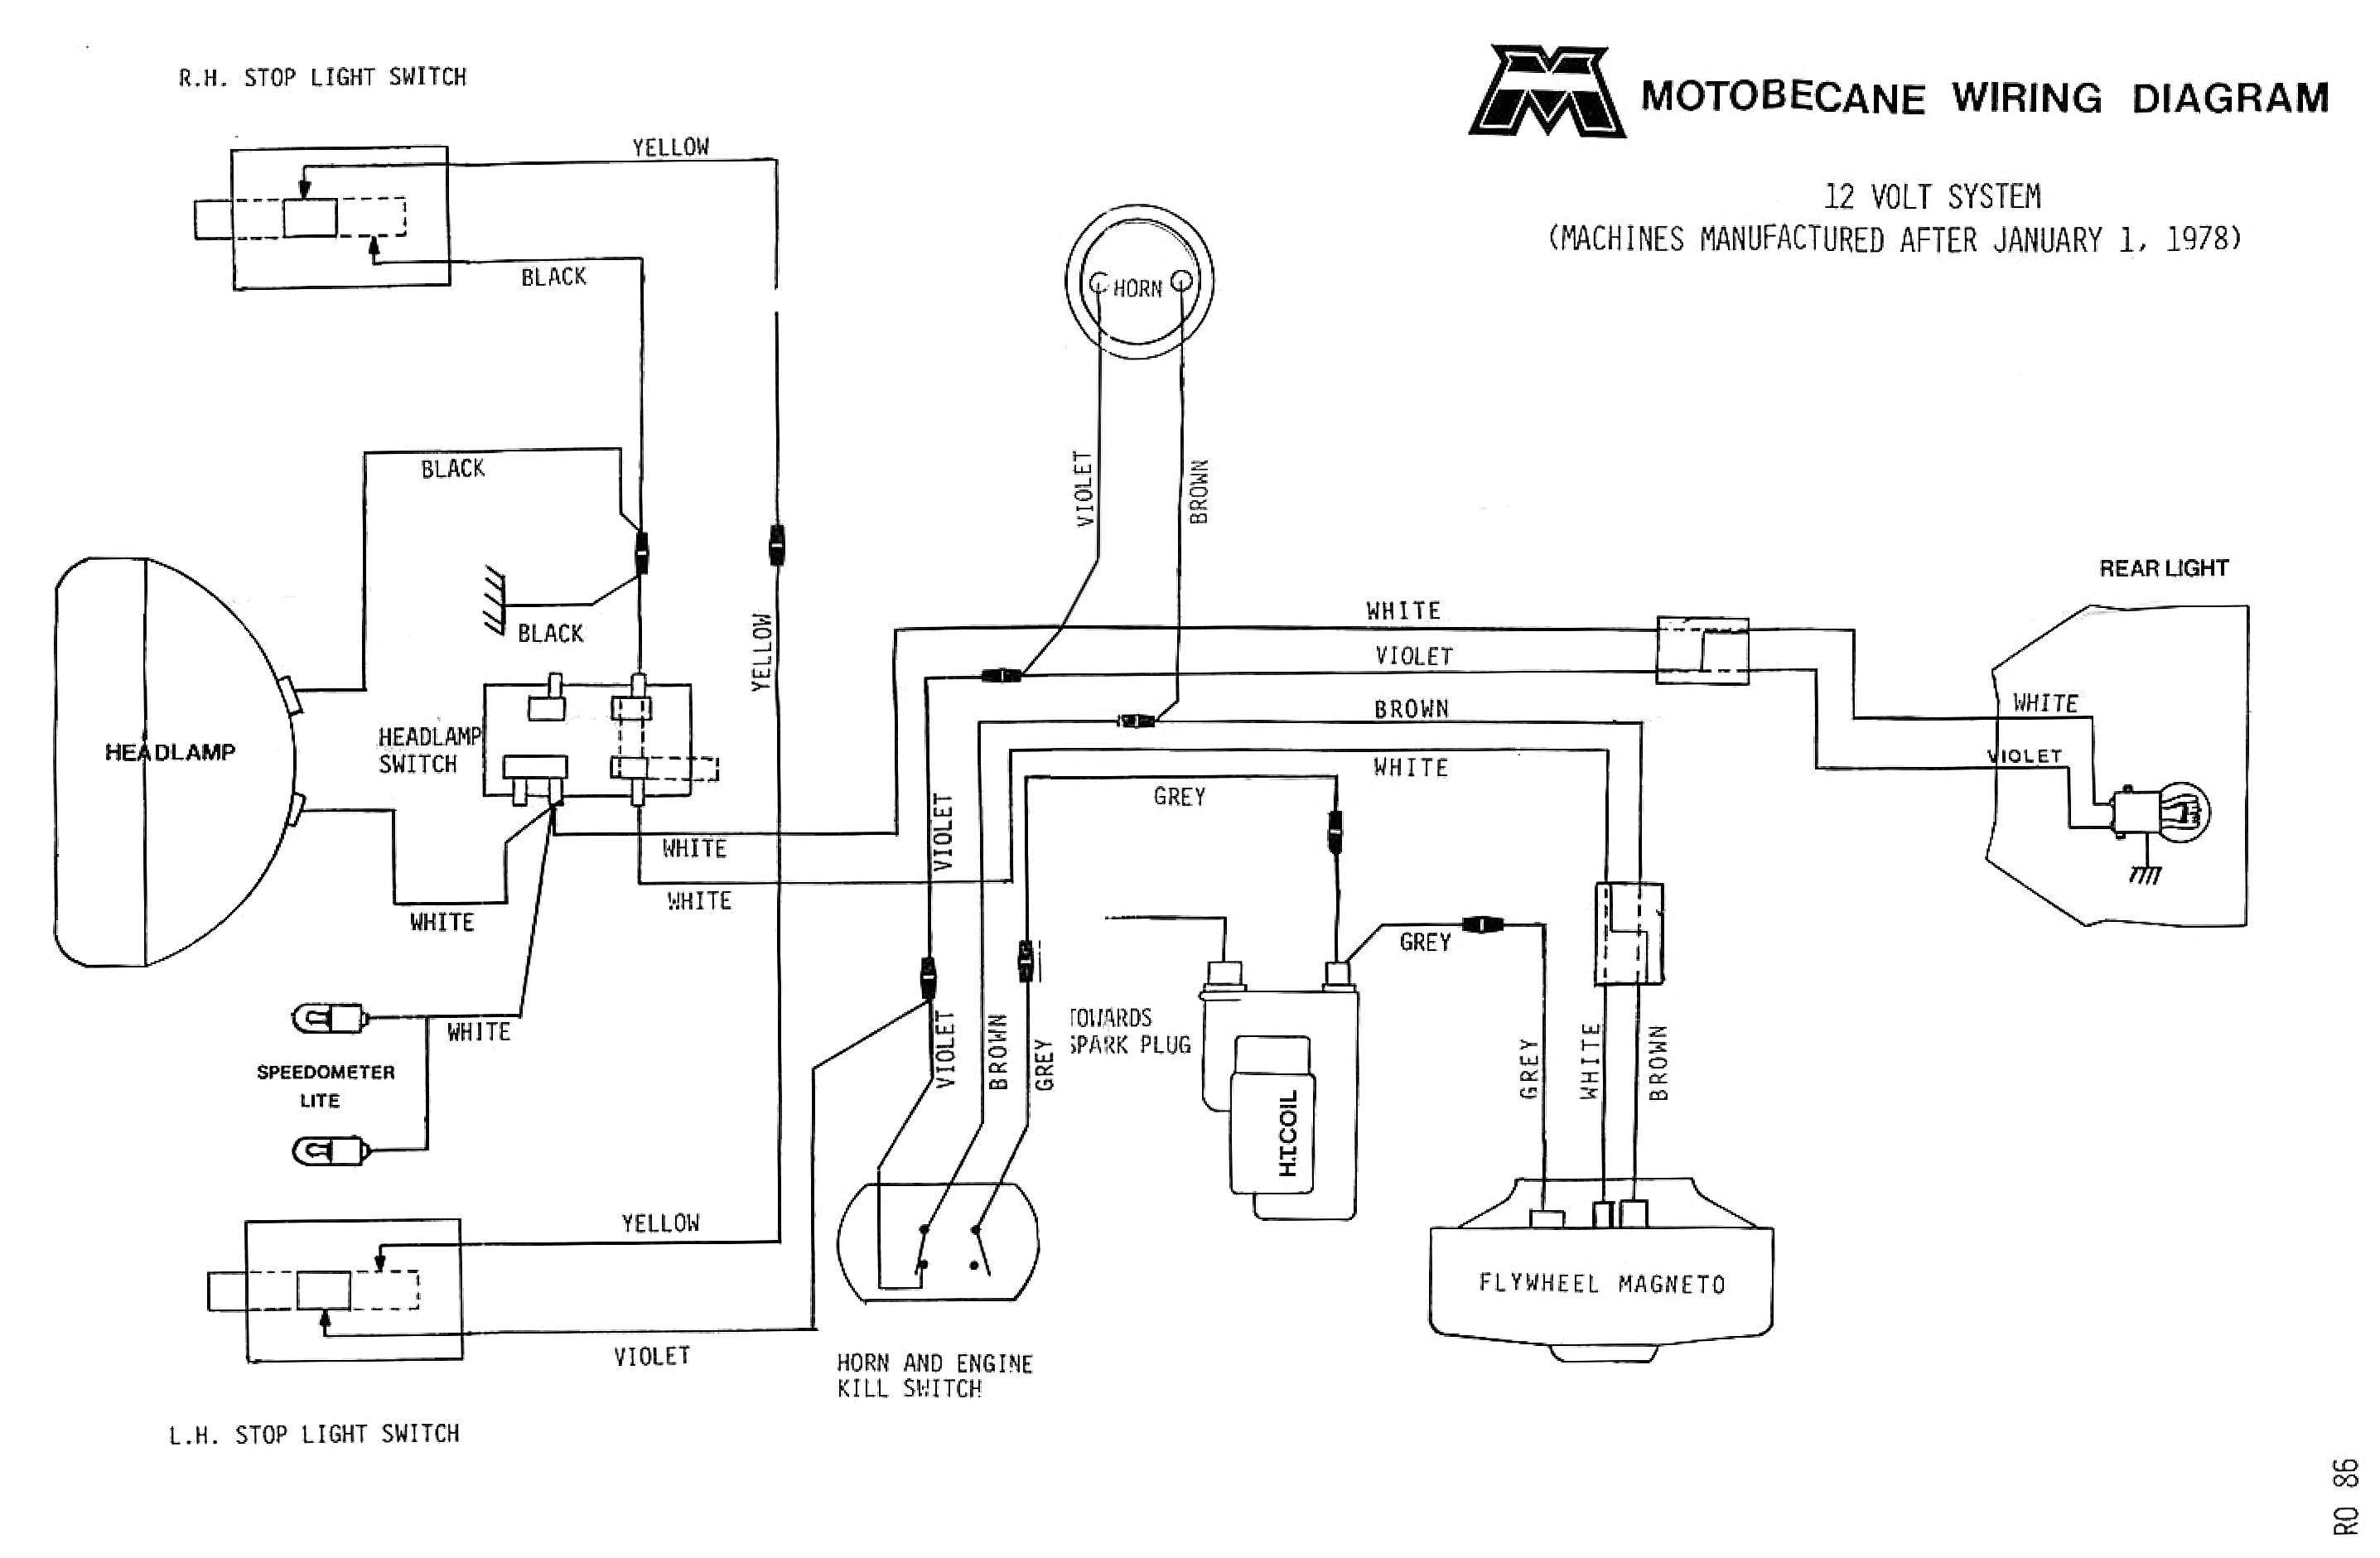 1948 ford 8n ignition wiring diagram wiring diagram post 1948 ford wiring diagram 1948 ford wiring diagram